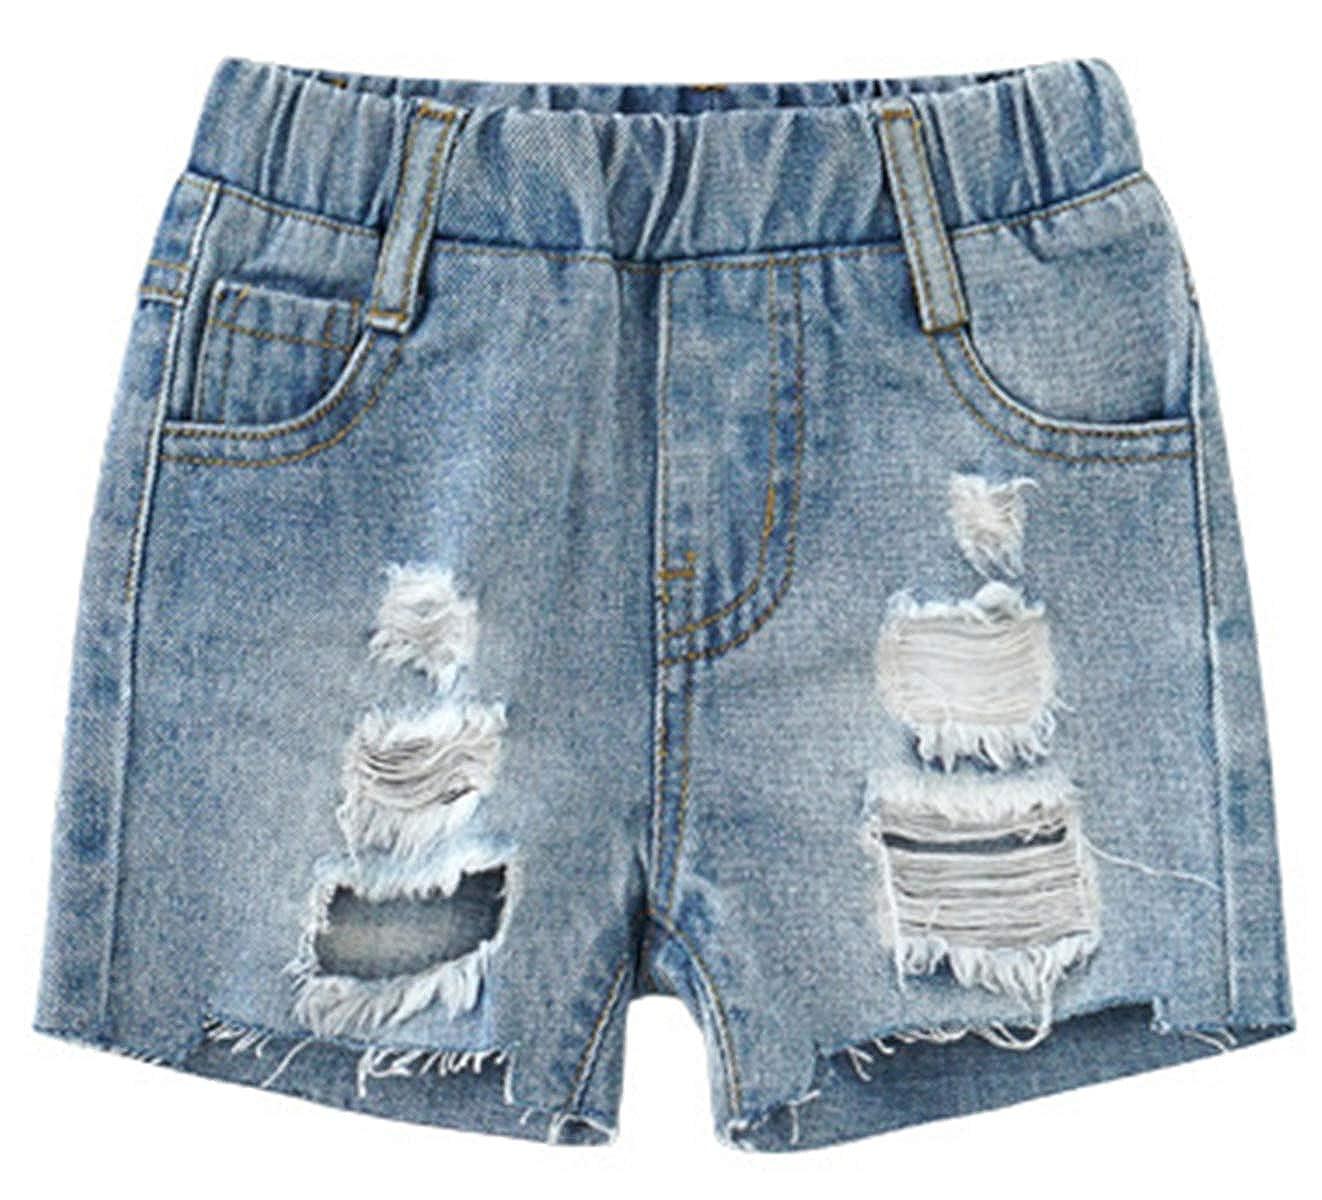 Betusline Toddler Boys Ripped Denim Shorts 12 Month 4 Years